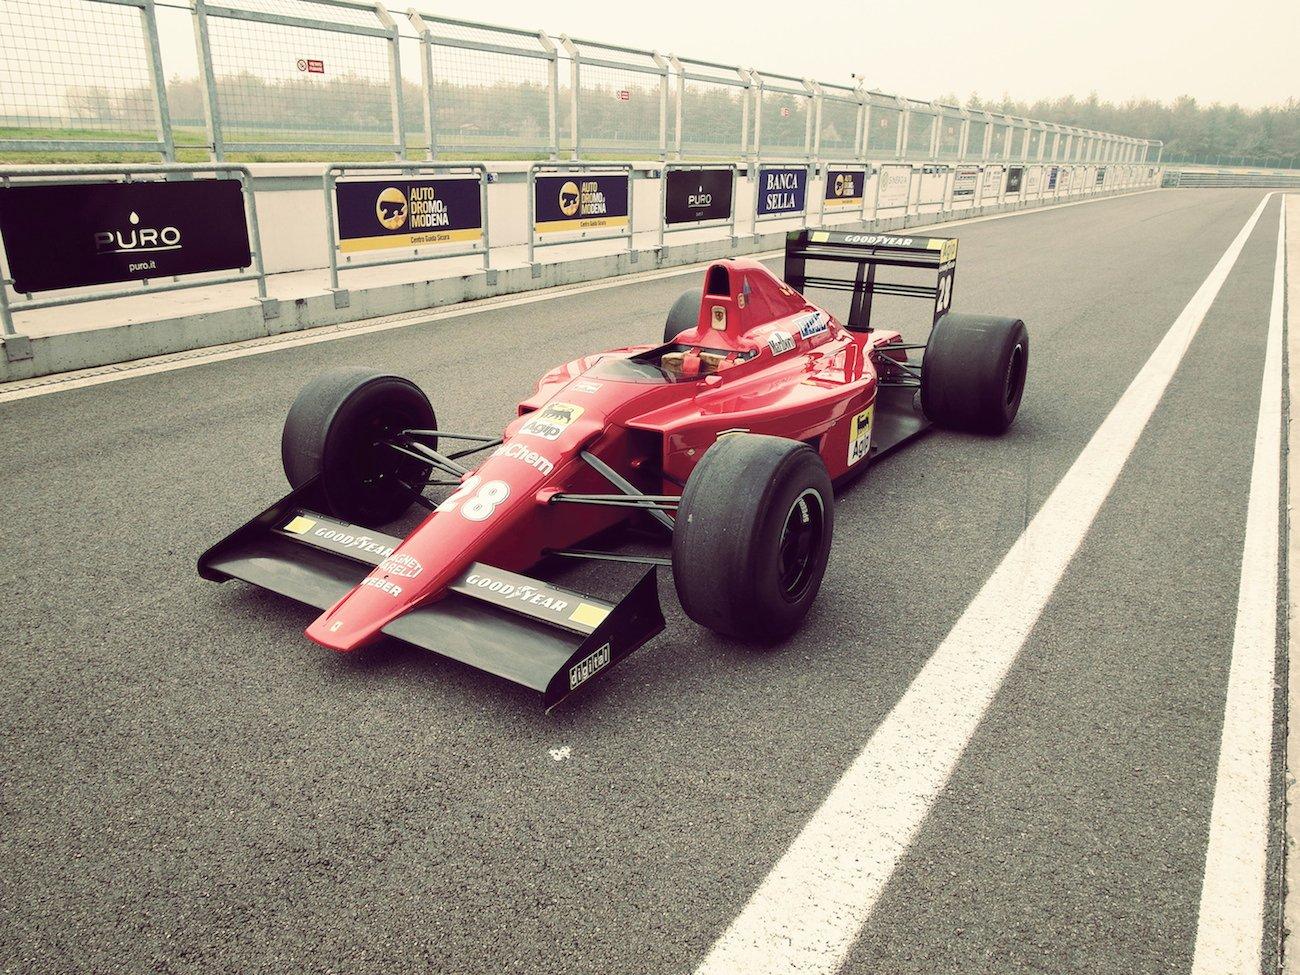 Lovely Old F1 Car For Sale Photos - Classic Cars Ideas - boiq.info